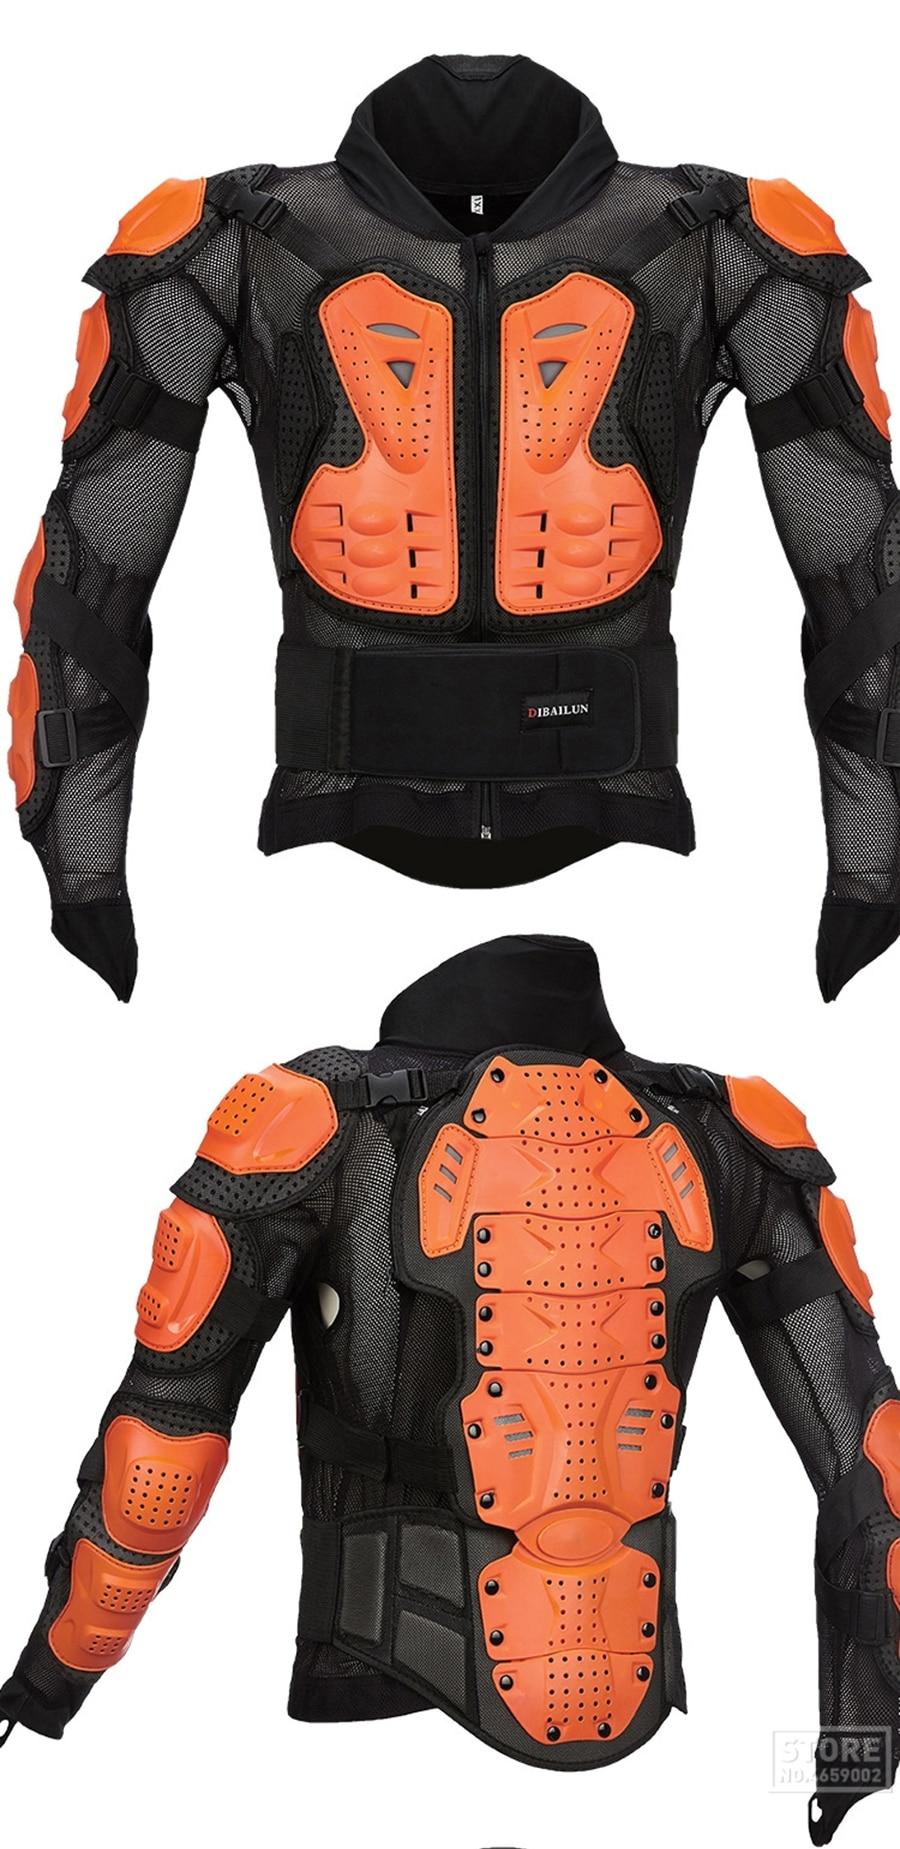 HEROBIKER-Motociclo-Del-Rivestimento-di-Motocross_09